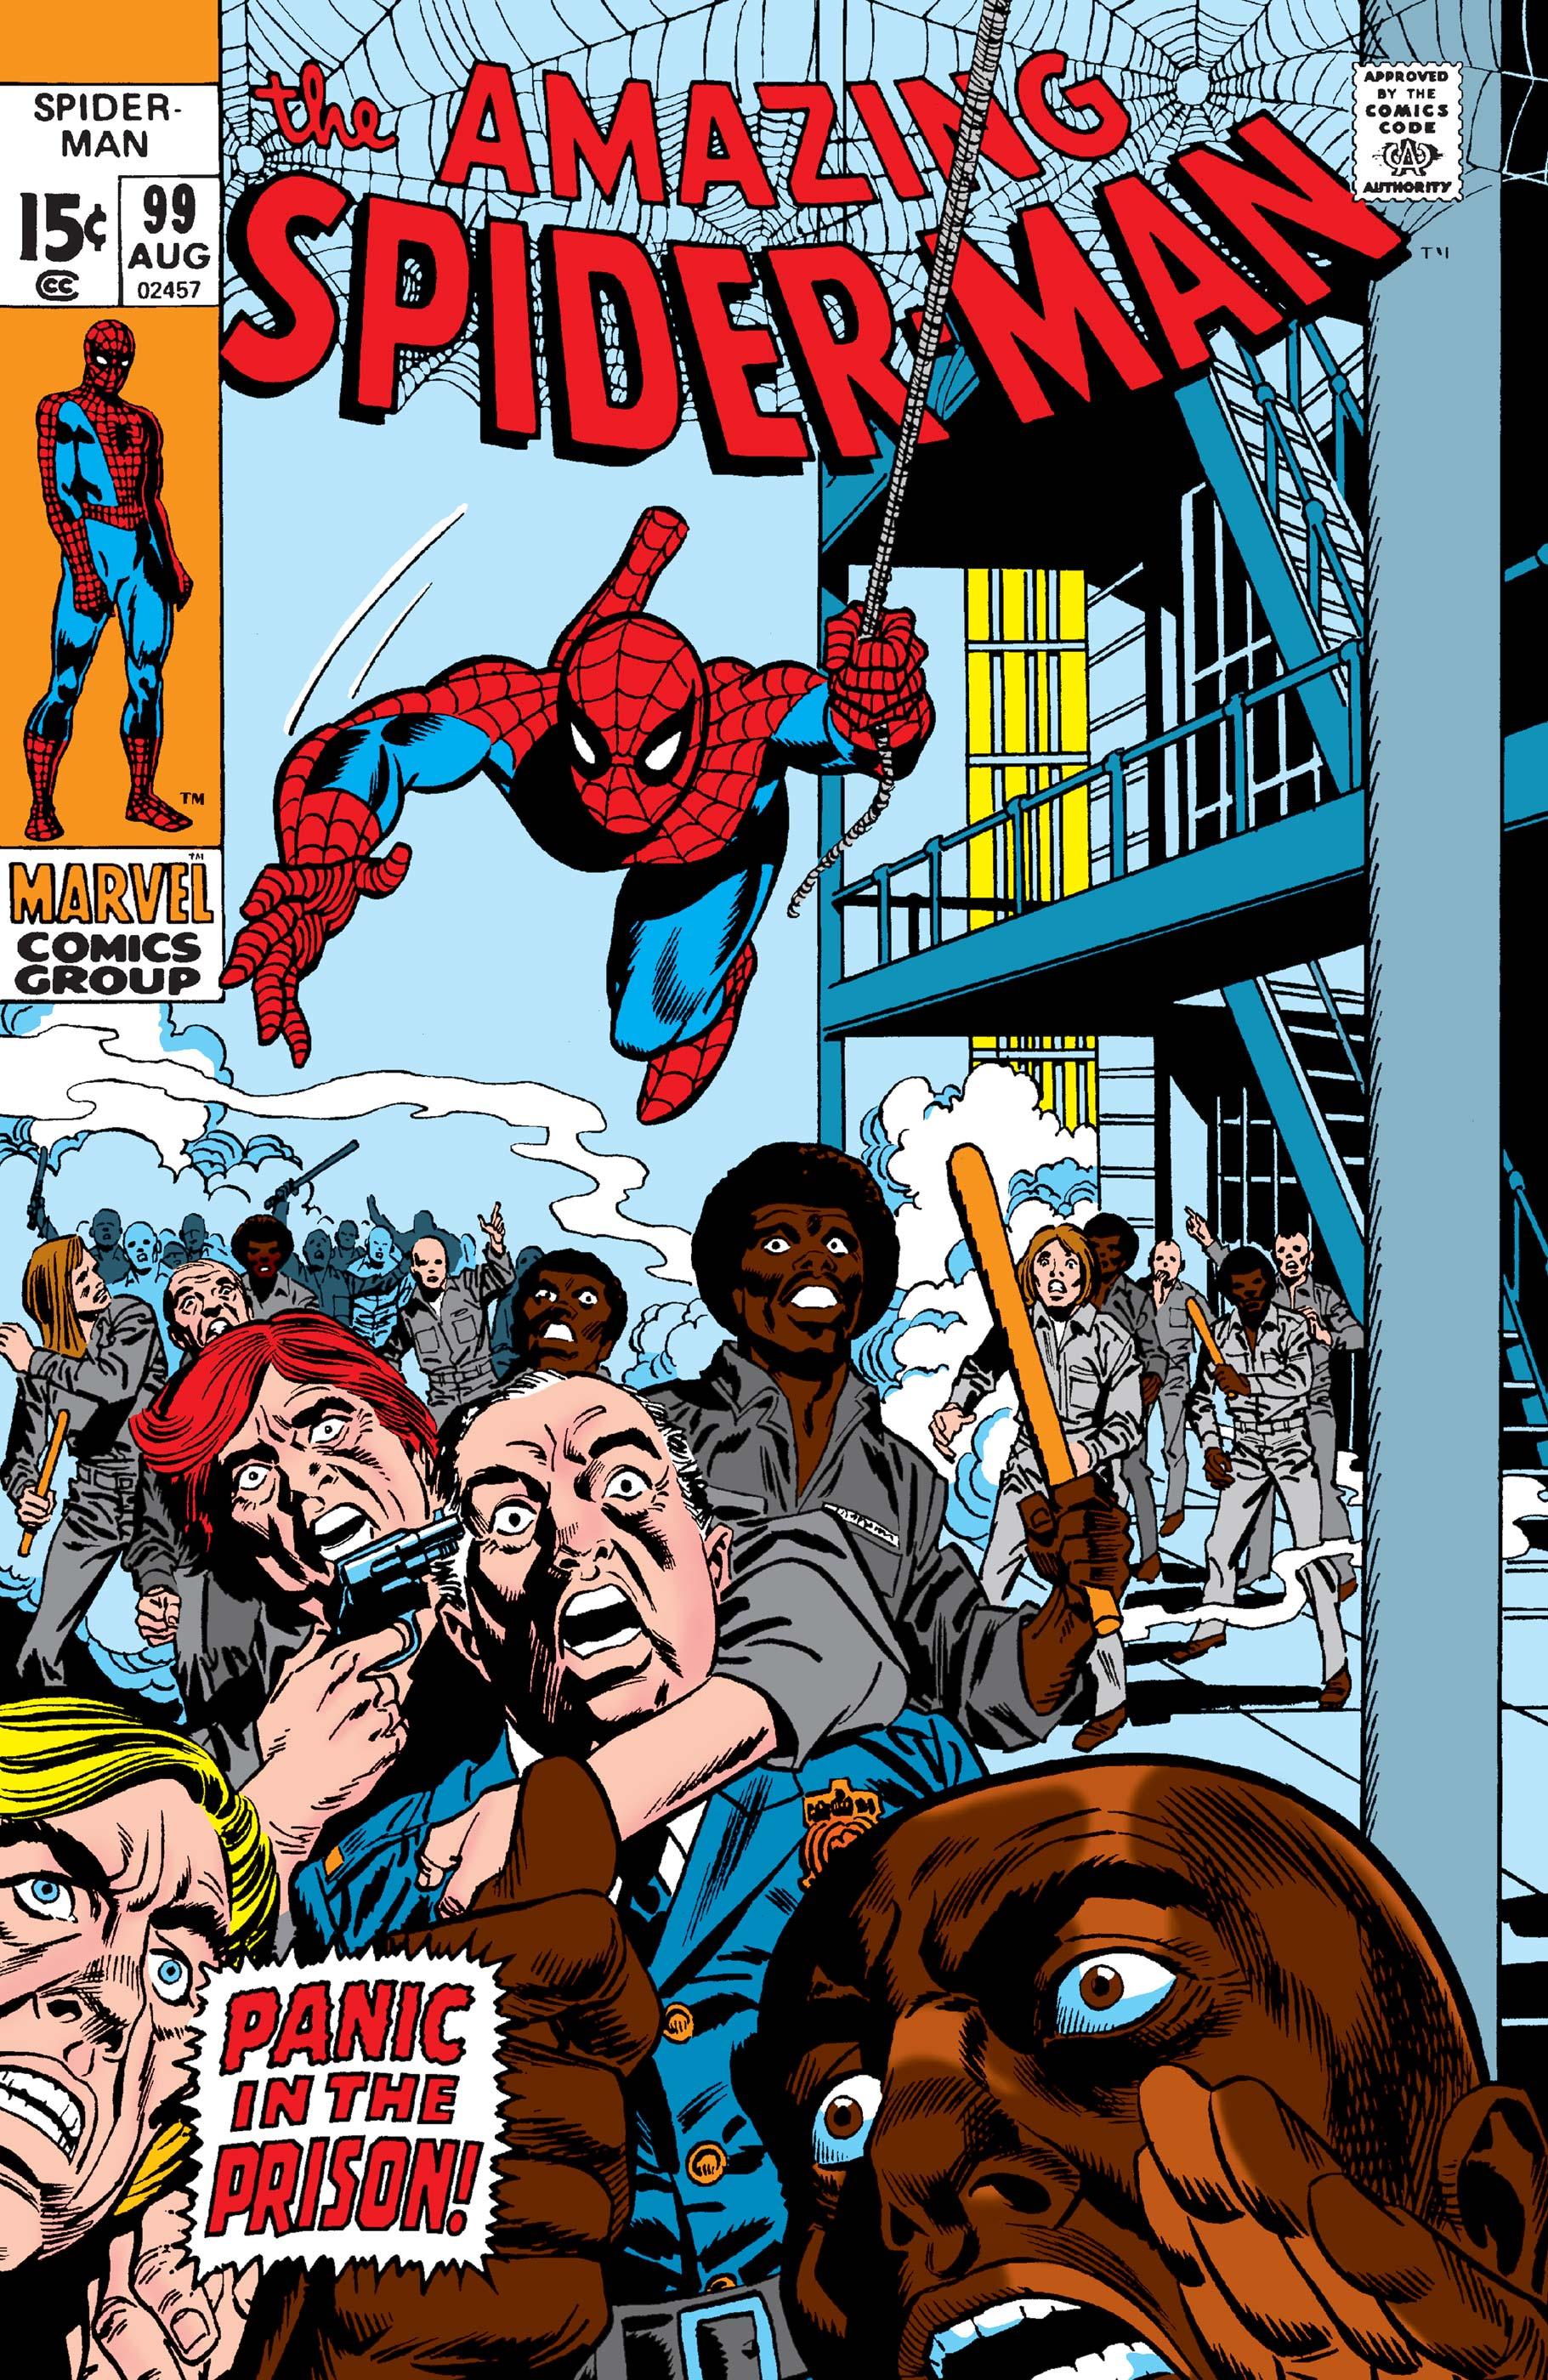 The Amazing Spider-Man (1963) #99